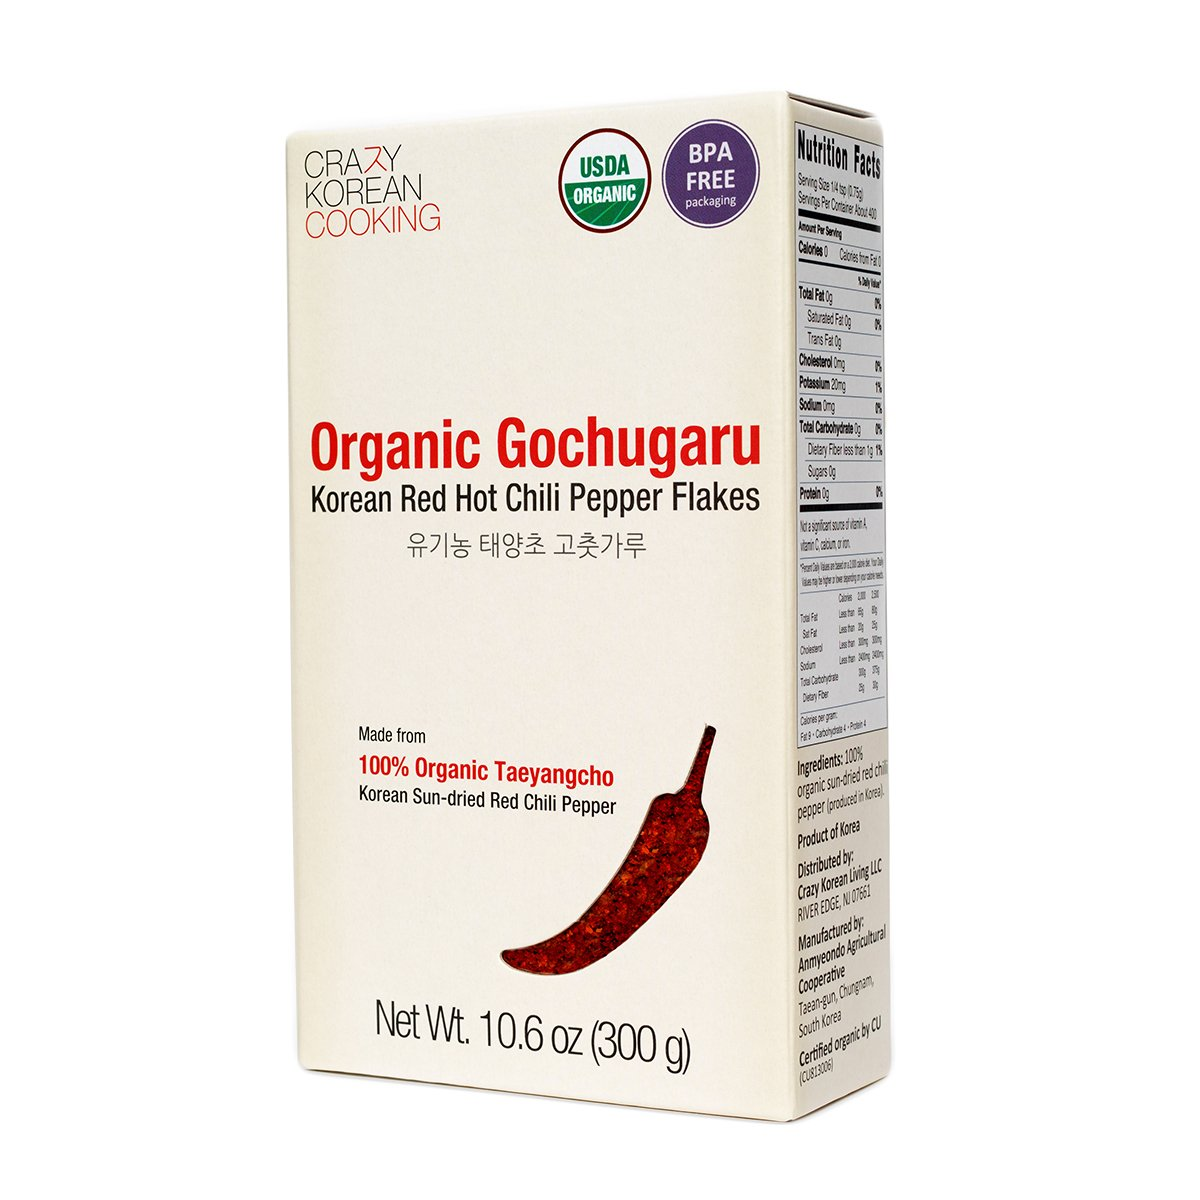 Gochugaru Organic, USDA Certified Organic Red Hot Chili Pepper Flakes, Korean Sun-Dried 10.6 oz